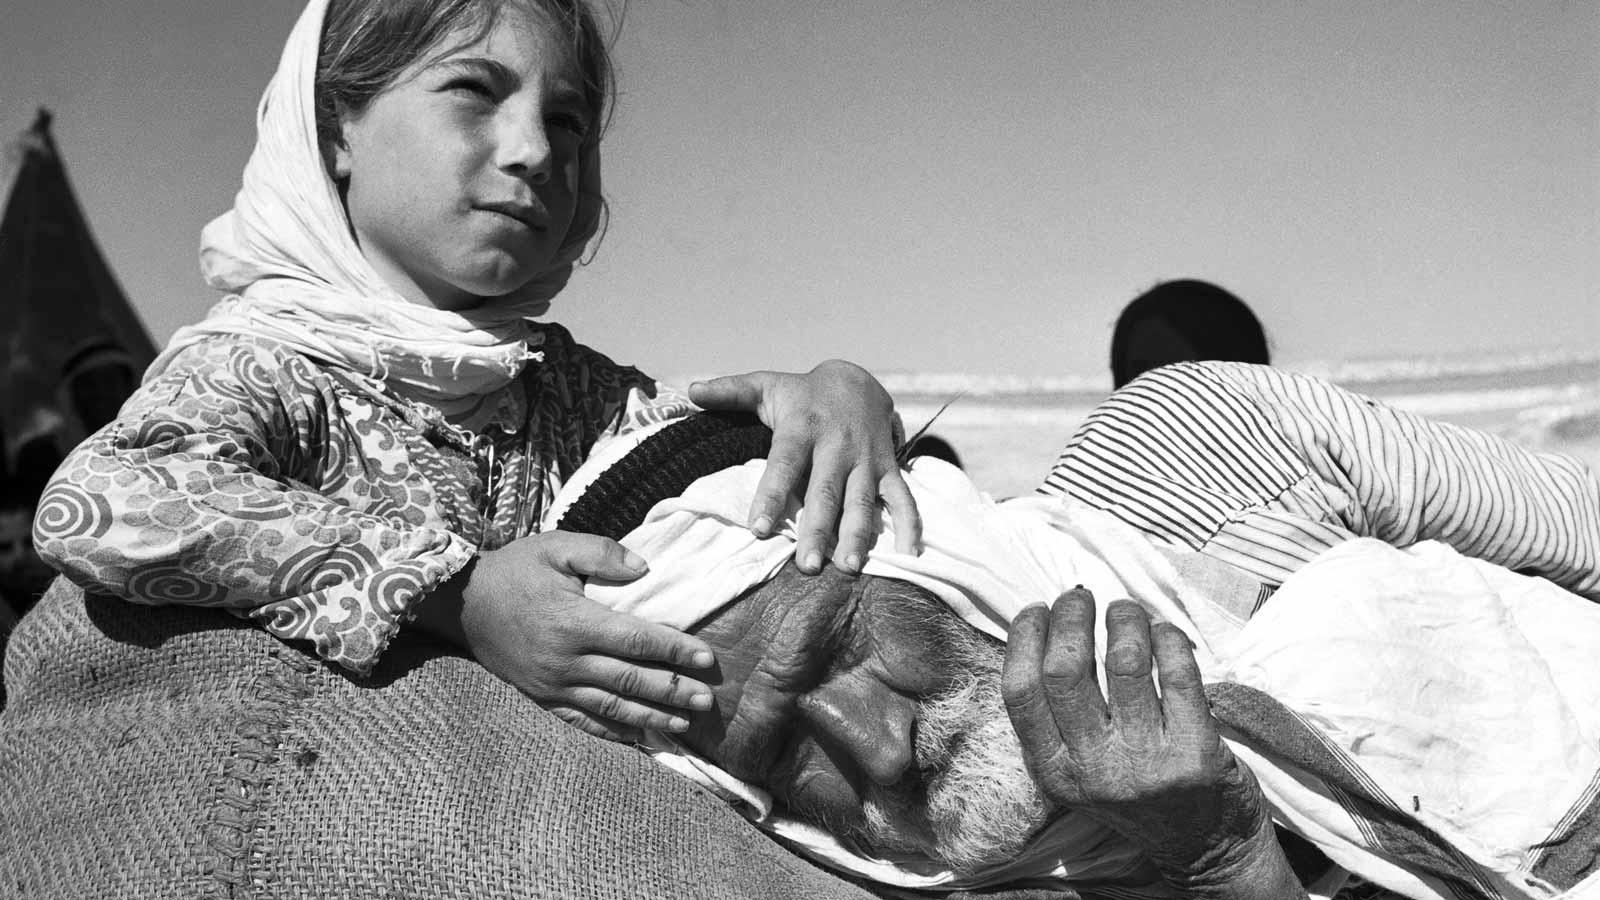 Israel's War on Culture | by Marisa Mazria Katz | NYR Daily